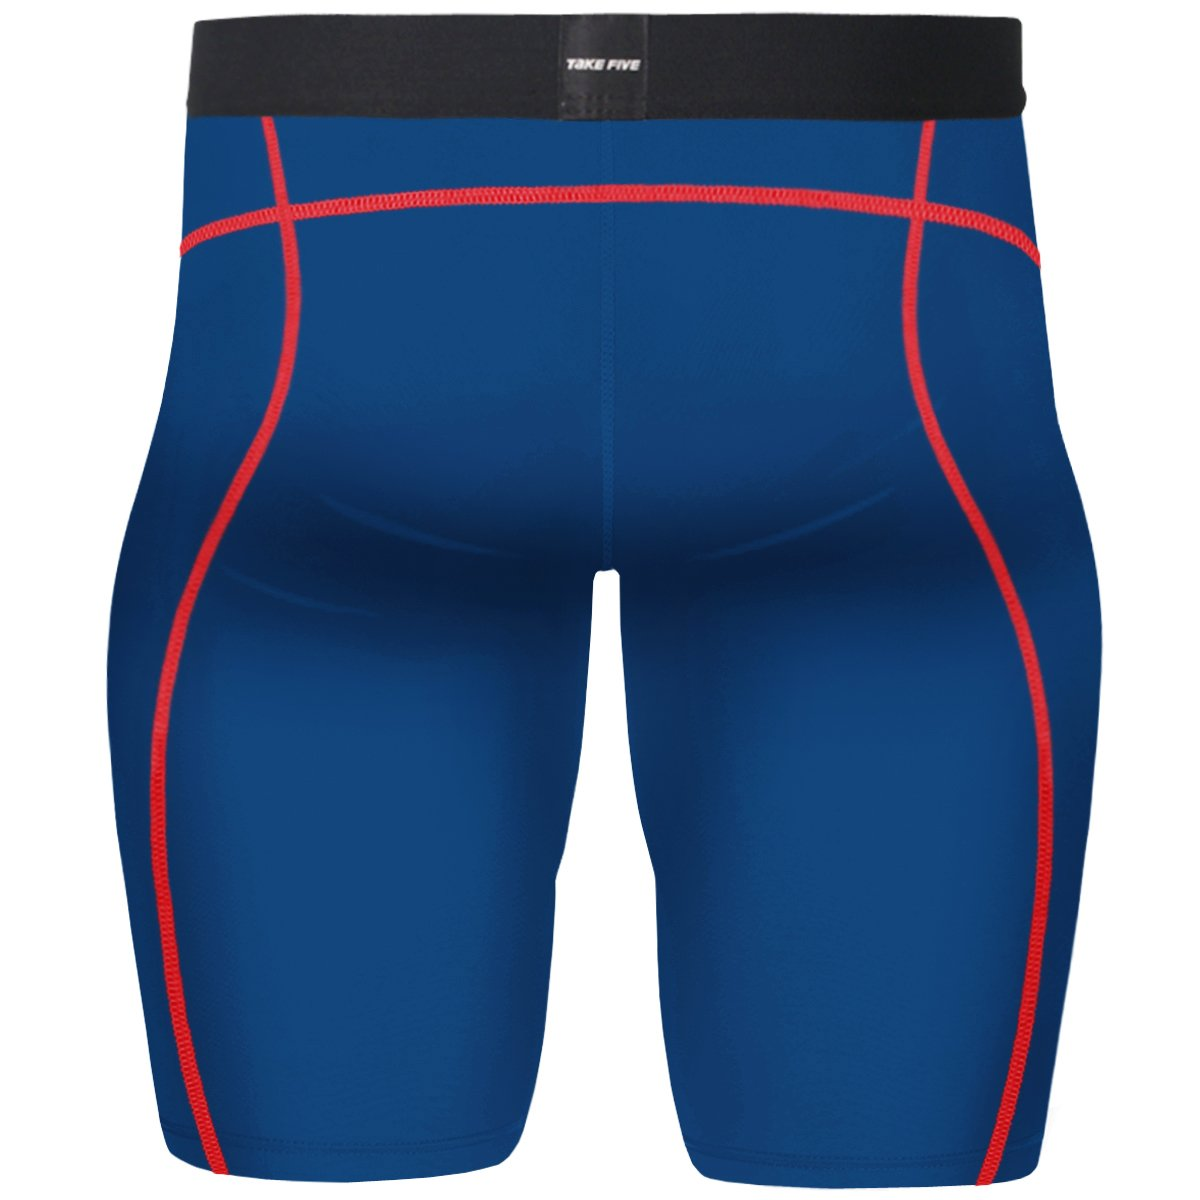 JustOneStyle New Sports Apparel Skin Tights Compression Active Base Underlayer Men Shorts